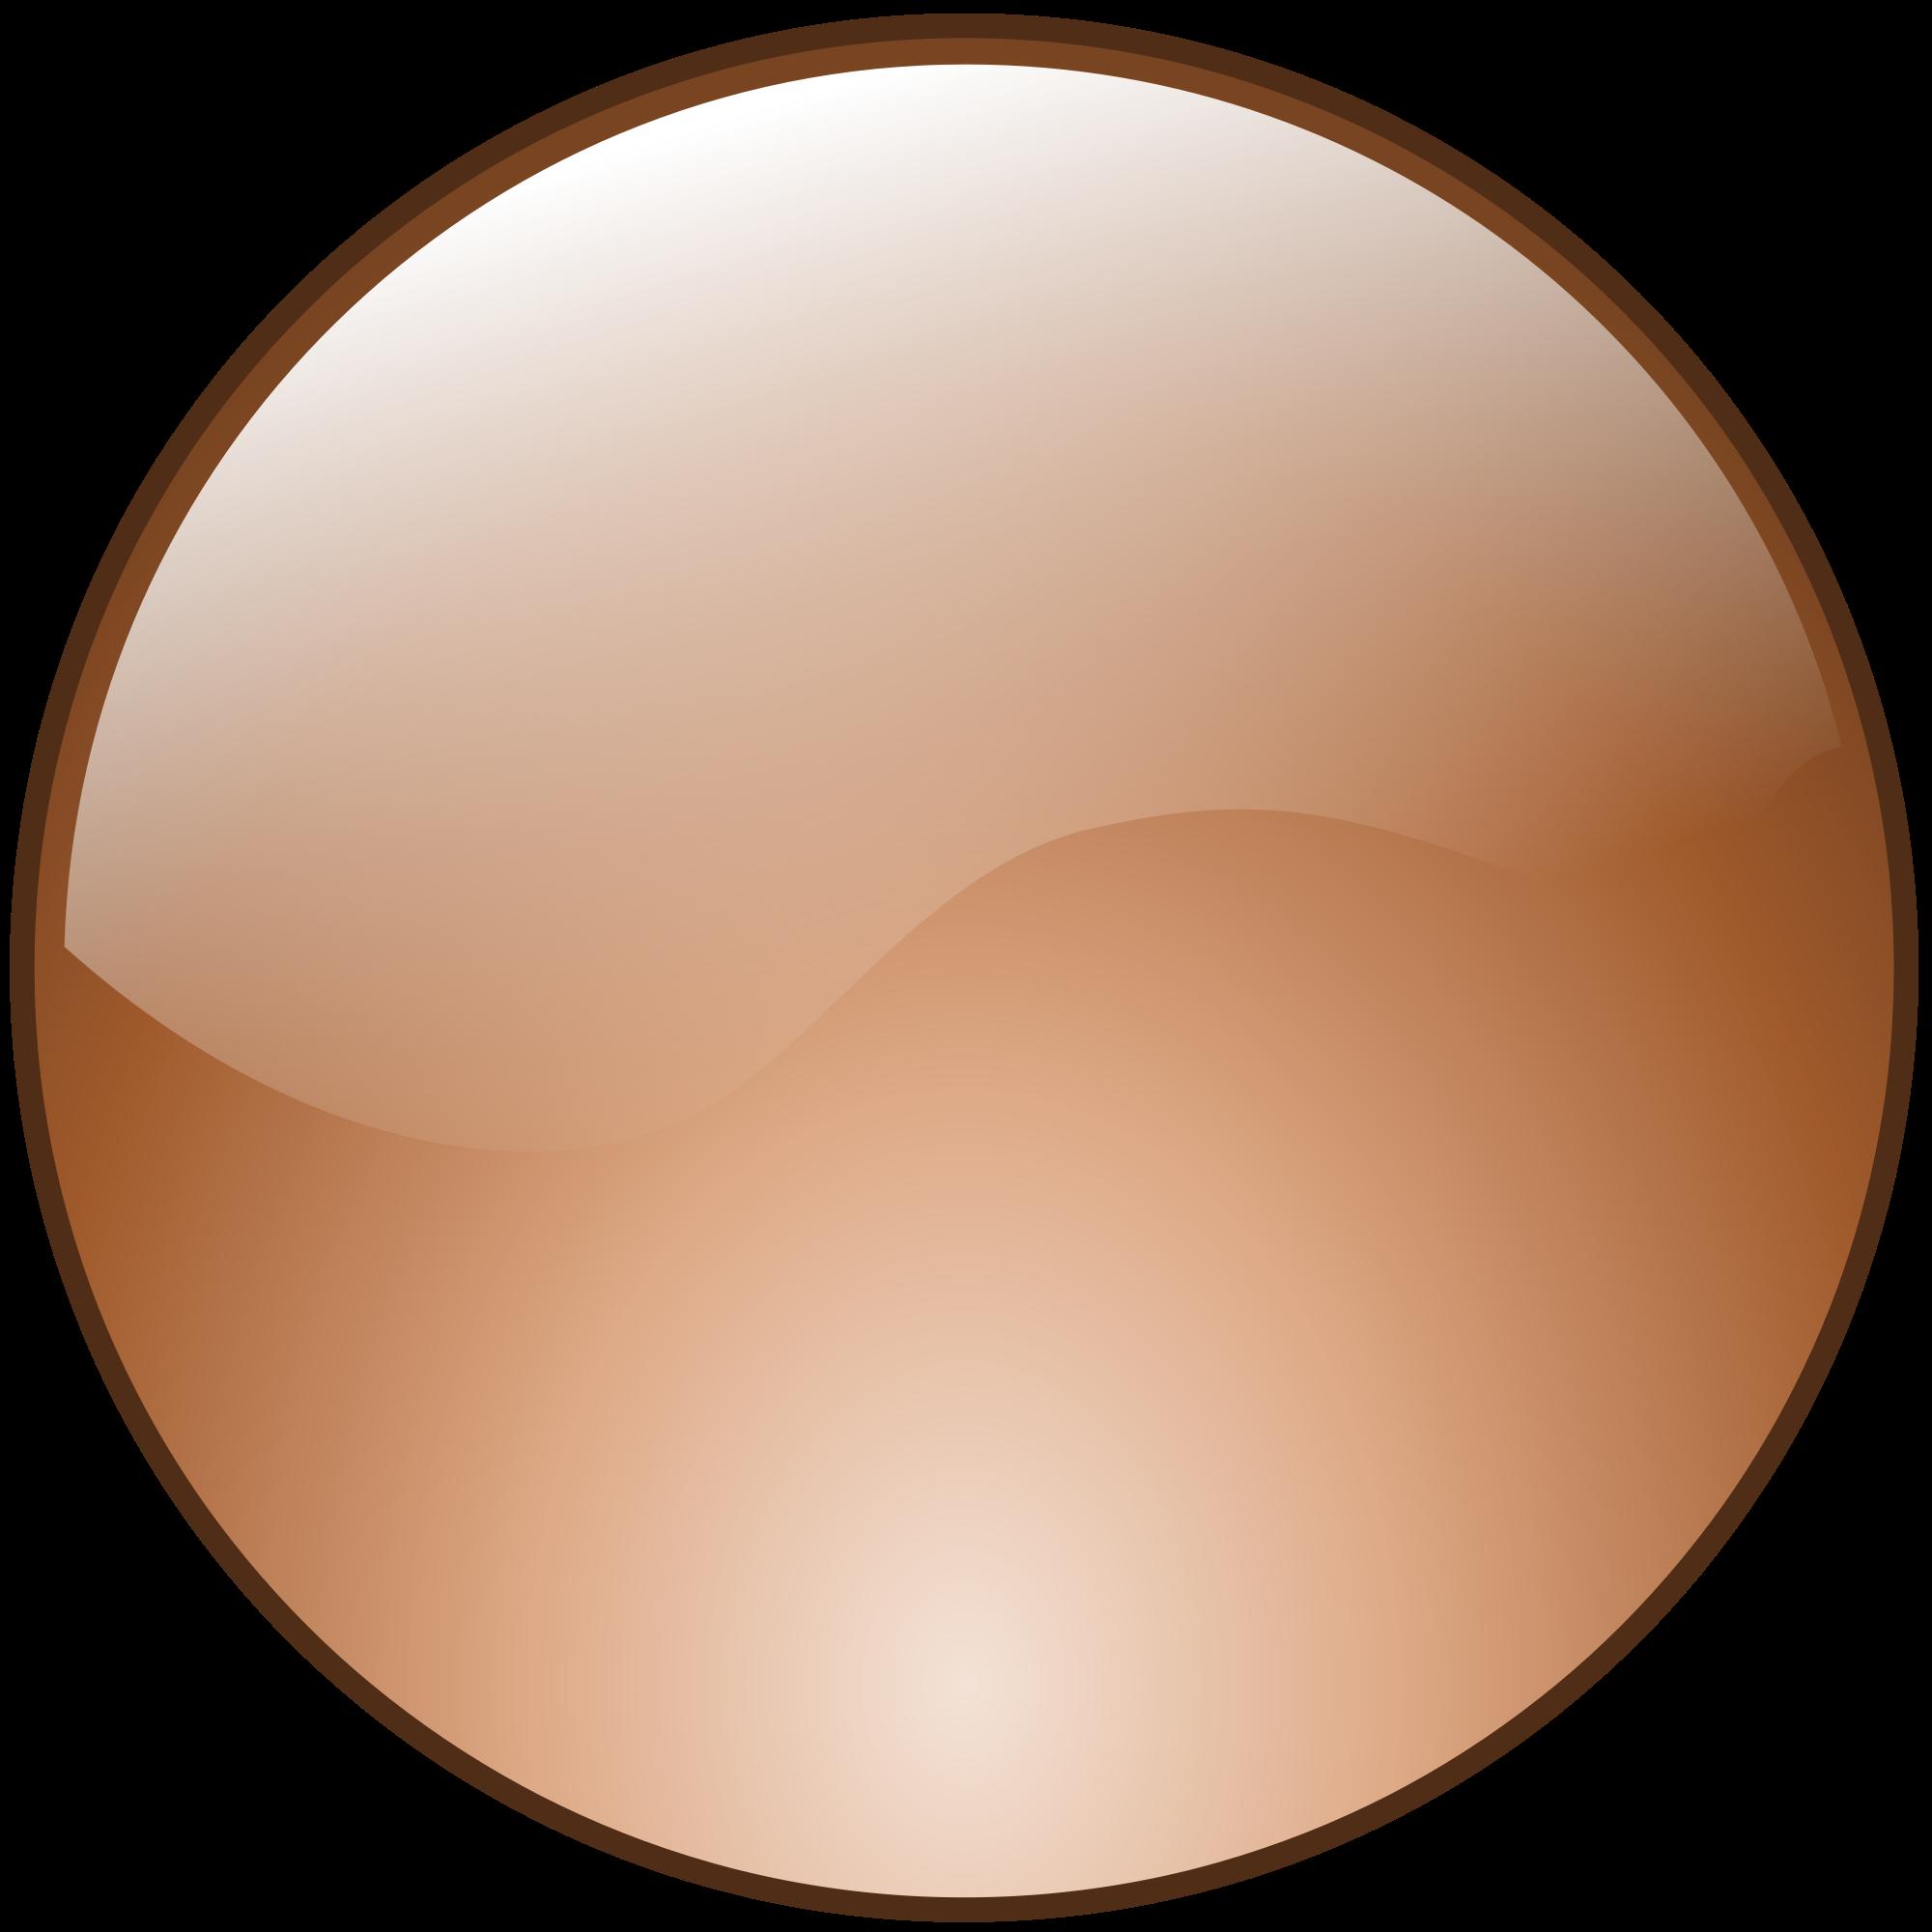 Button clipart brown Svg Icon File:Button Wikimedia Commons